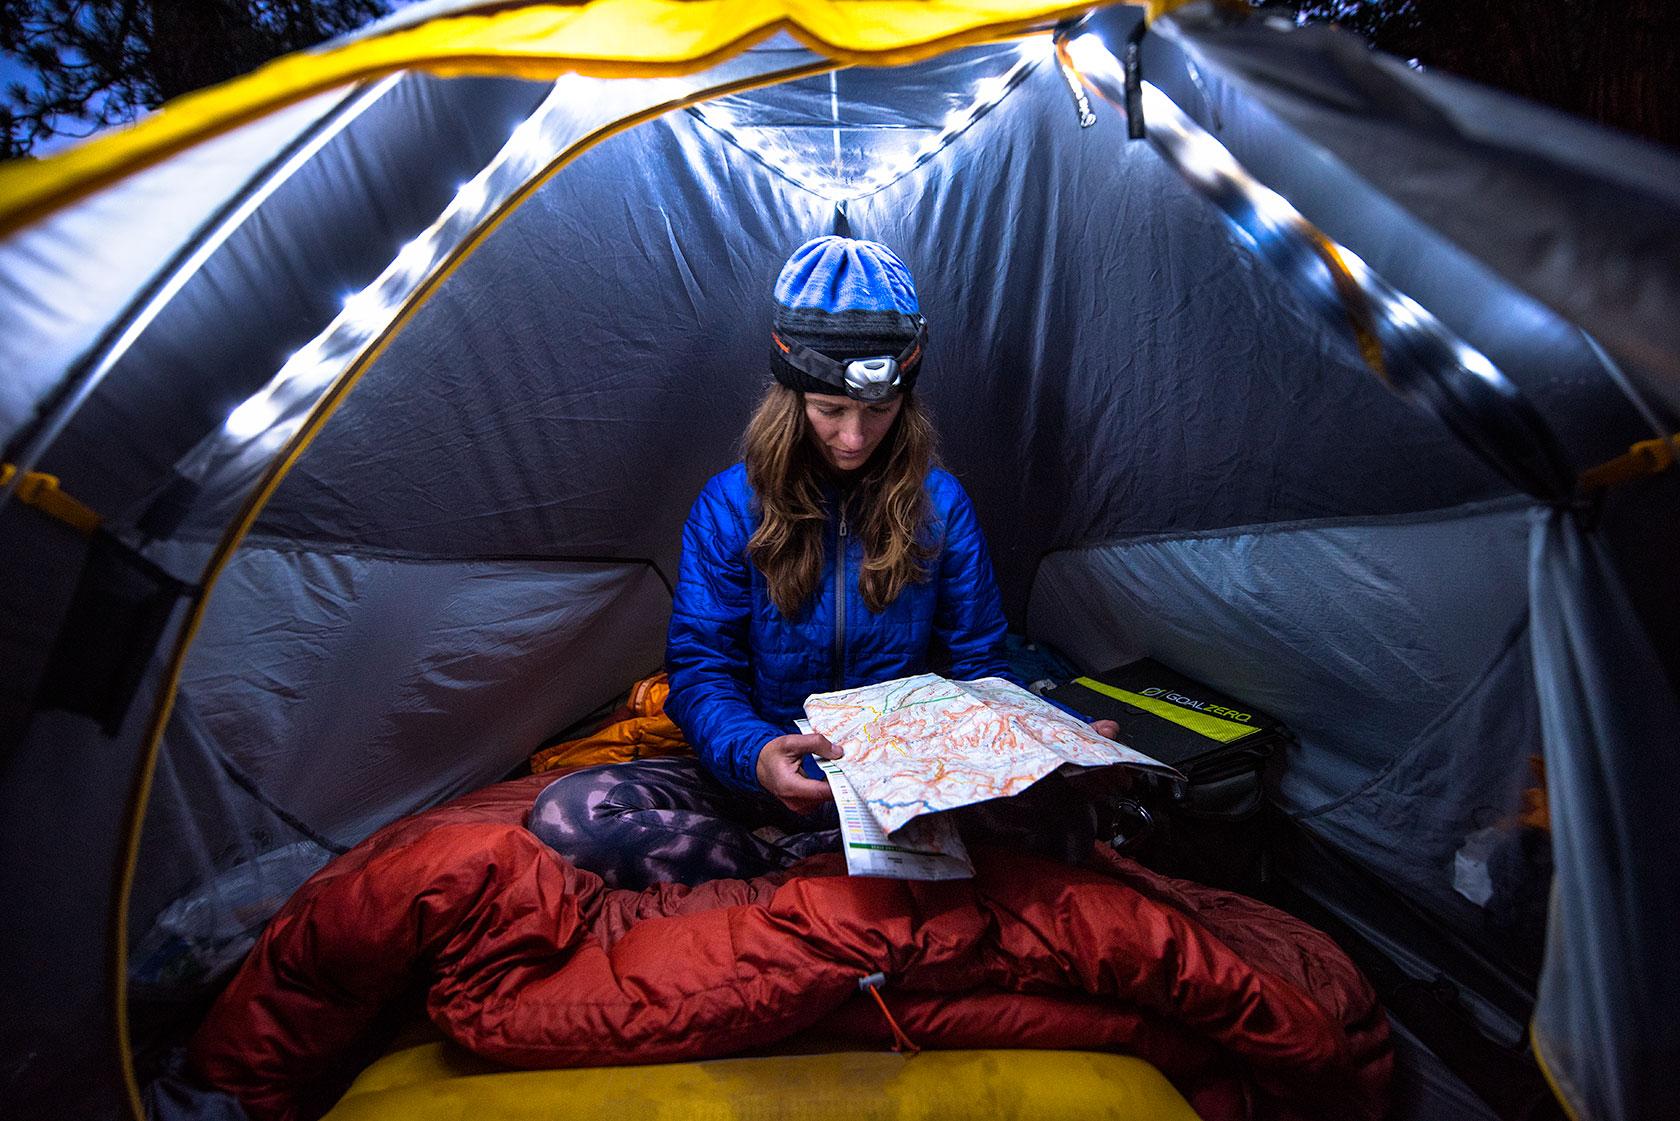 austin-trigg-big-agnes-tent-john-muir-trail-camping-light-Map-MTNGLO-FlyCreek.jpg